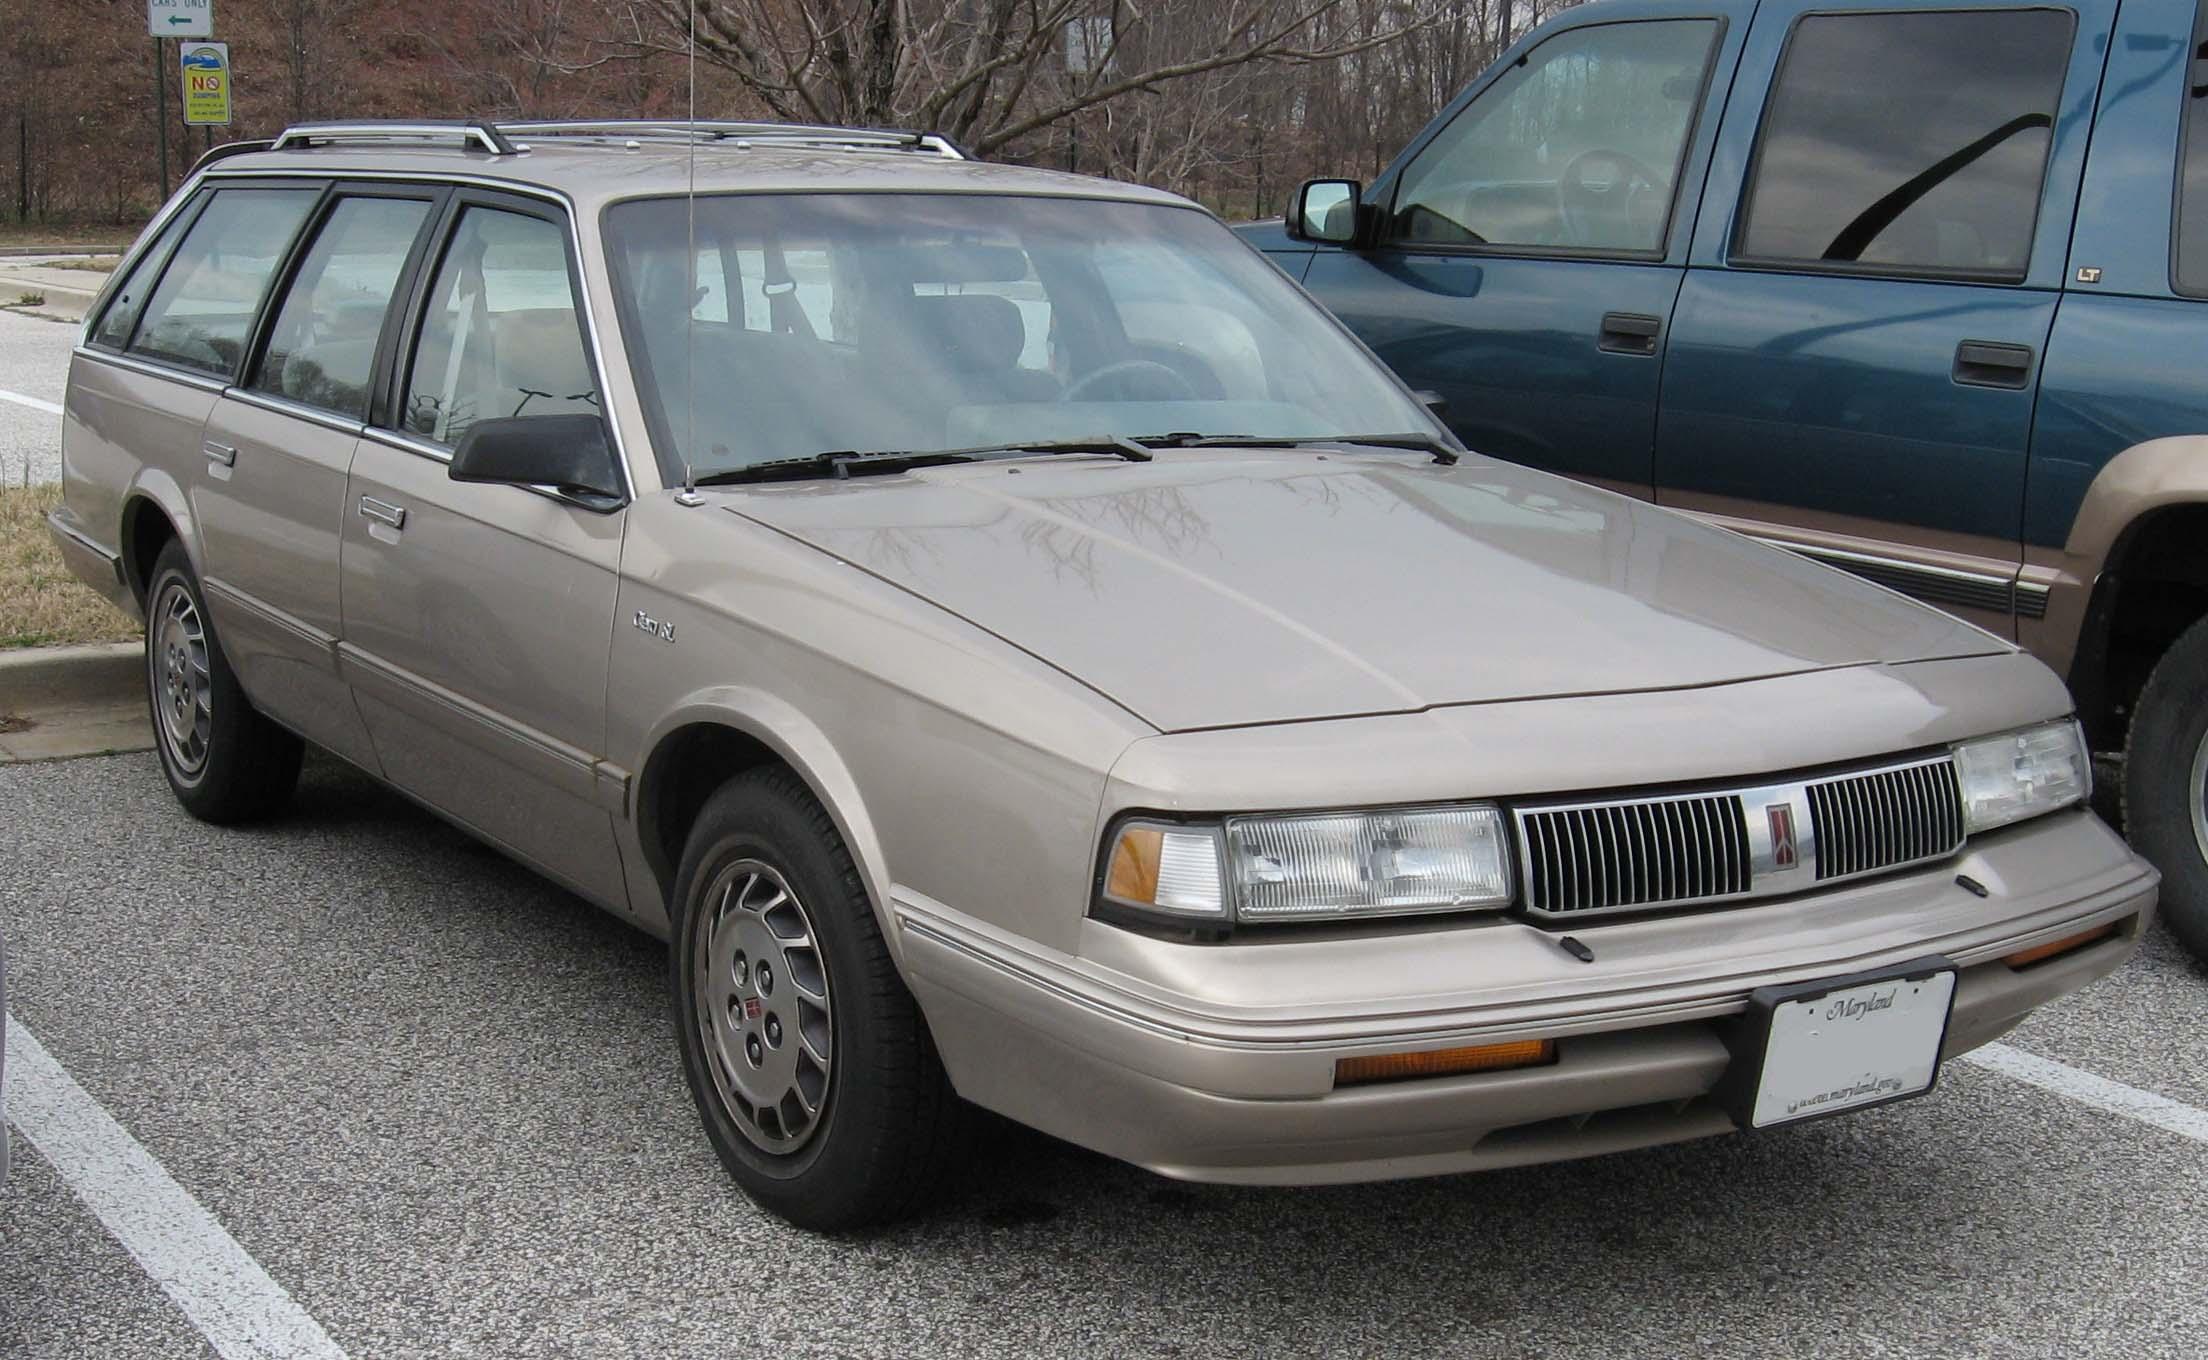 File:Oldsmobile Cutlass Cruiser.jpg - Wikimedia Commons